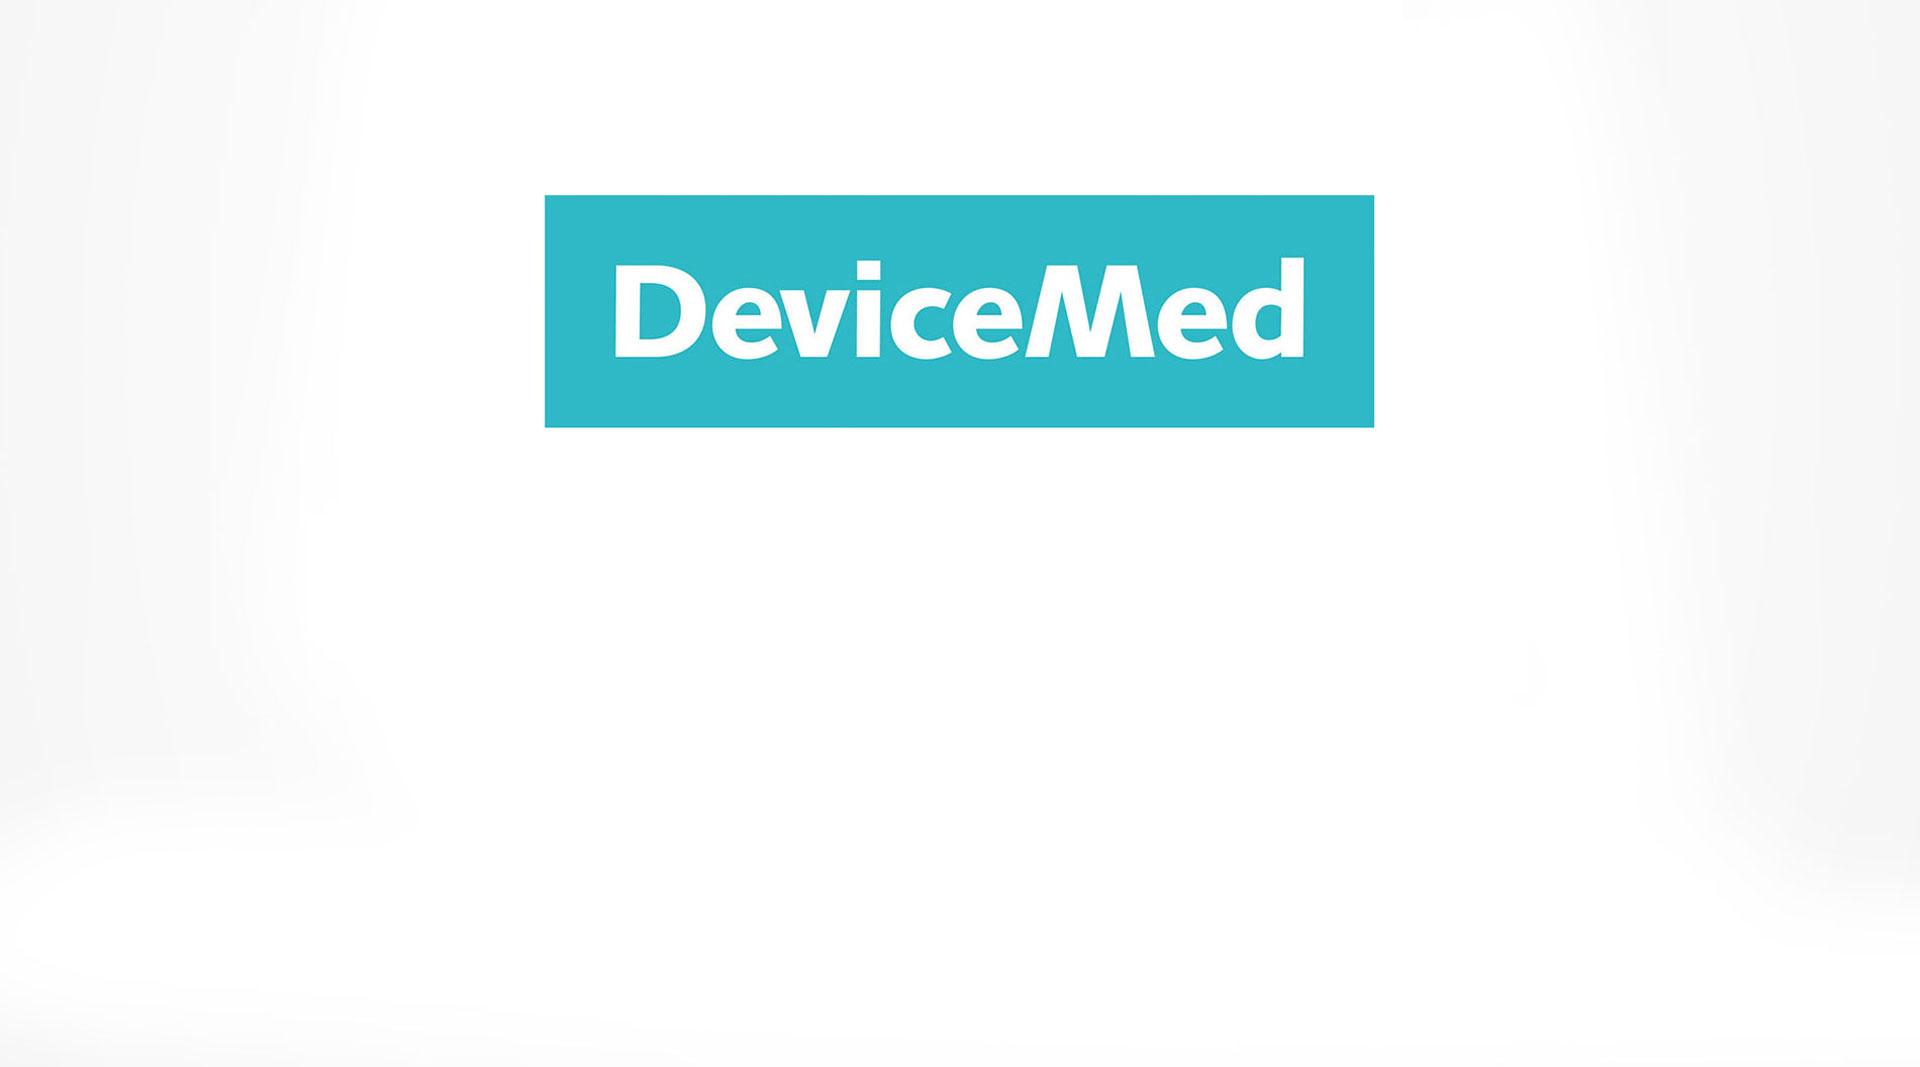 Logo DeviceMed Vogel Business Media